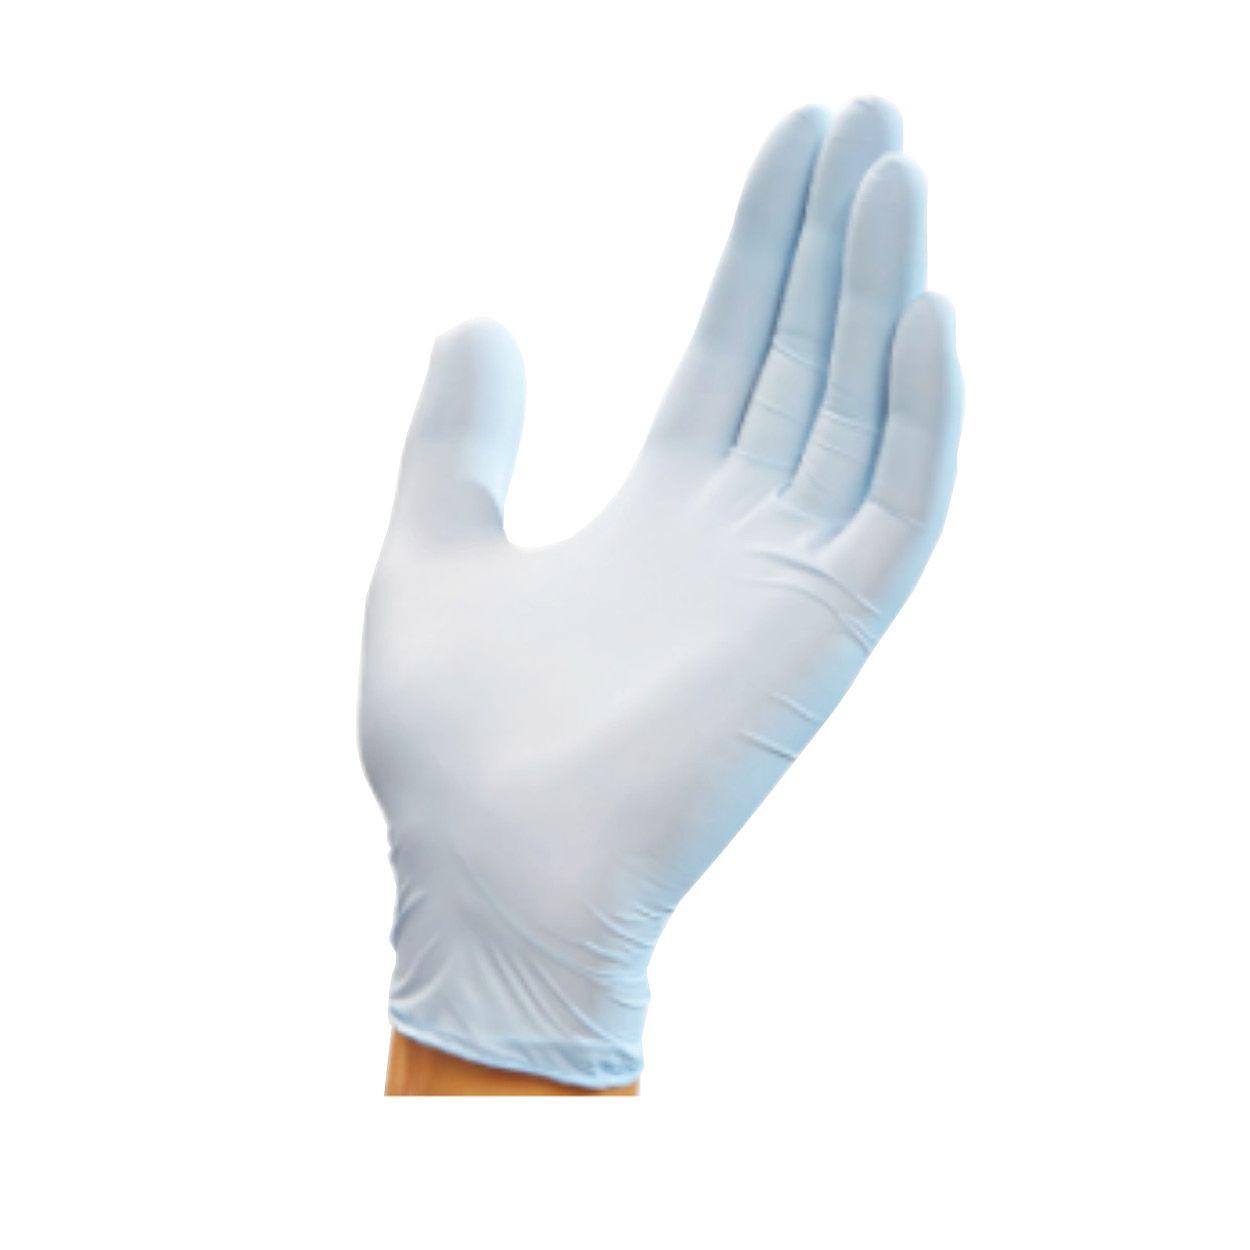 GloveOn COATS Powder Free Nitrile Examination Gloves